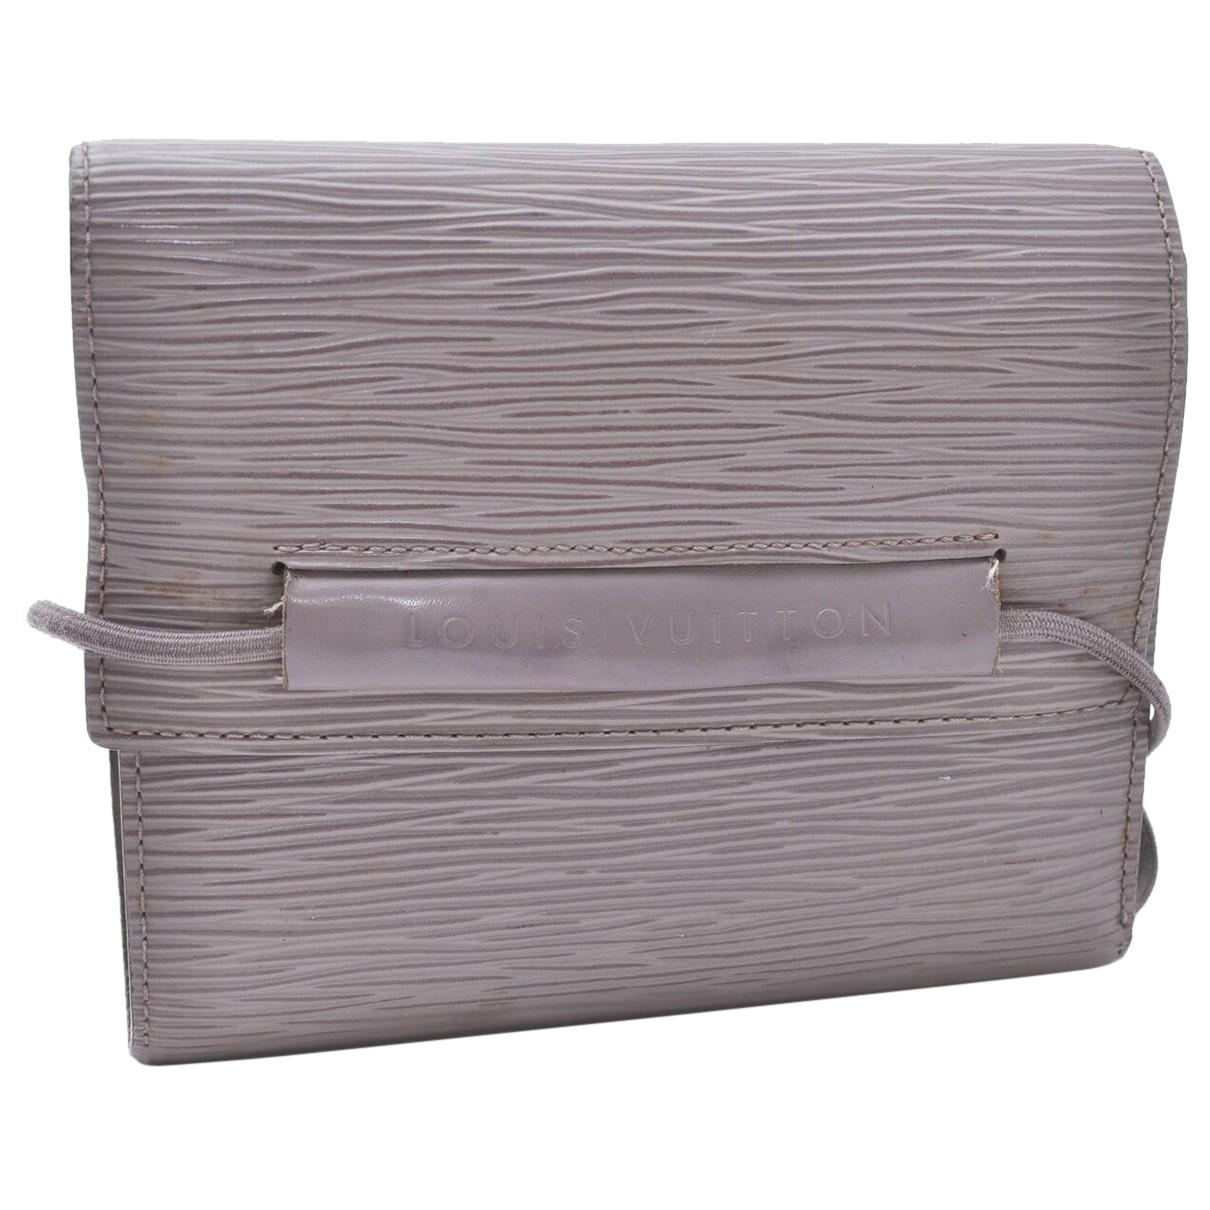 Louis Vuitton N Grey Leather wallet for Women N